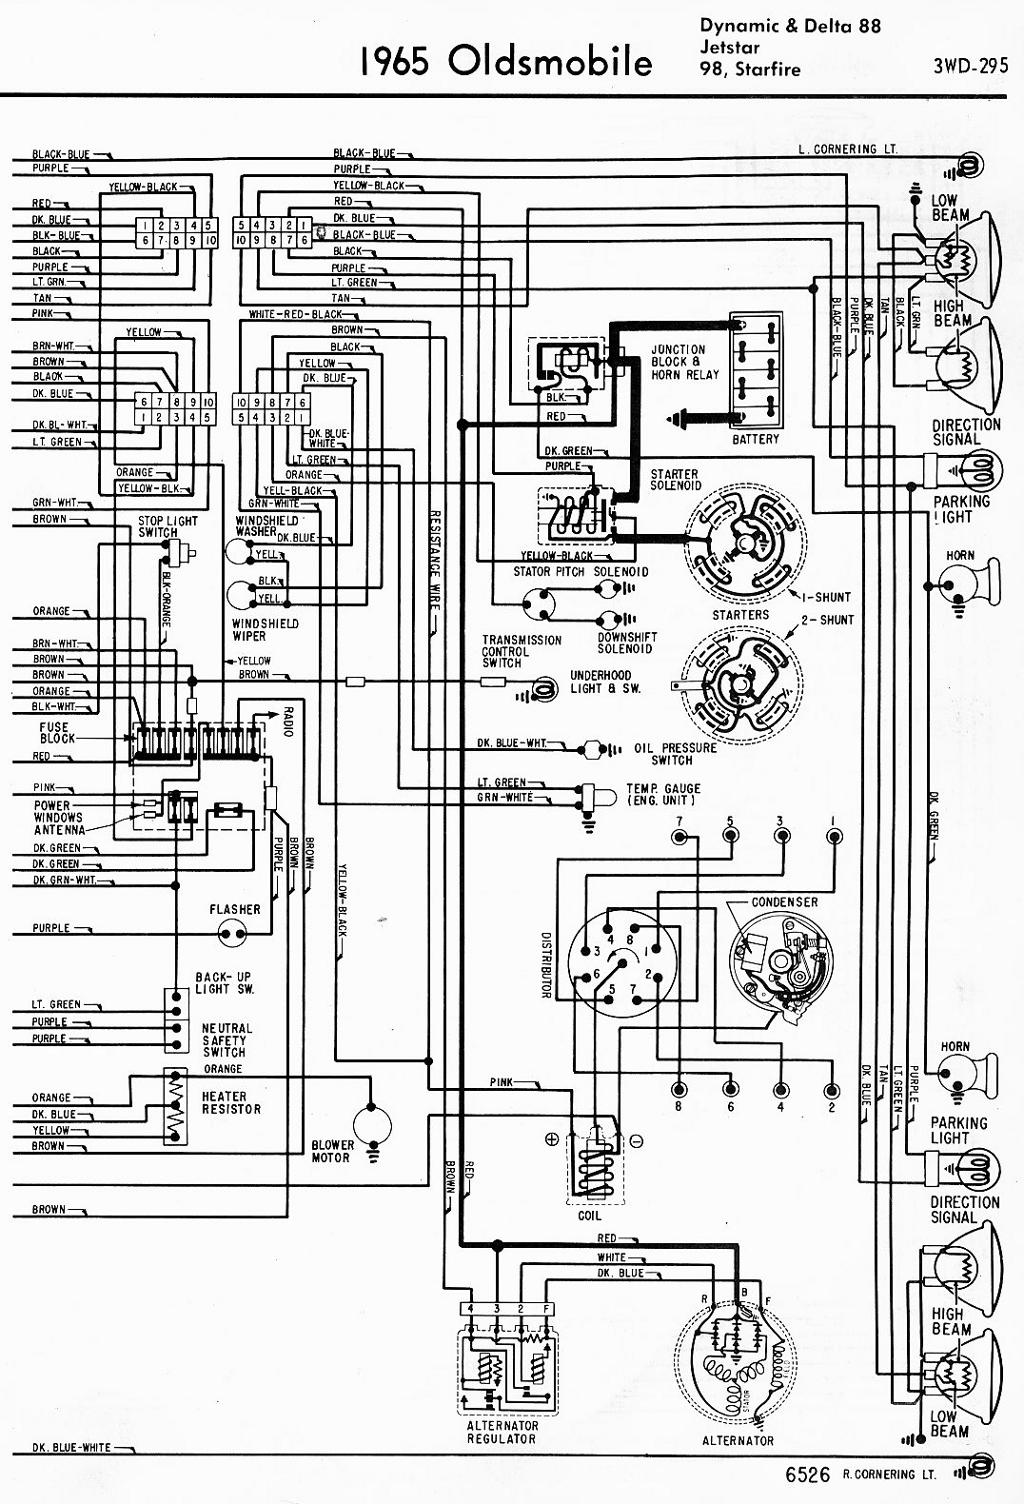 2008 nissan pathfinder instrument panel wiring diagram 1977 celica interior 1977 toyota celica wiring diagram [ 1024 x 1504 Pixel ]